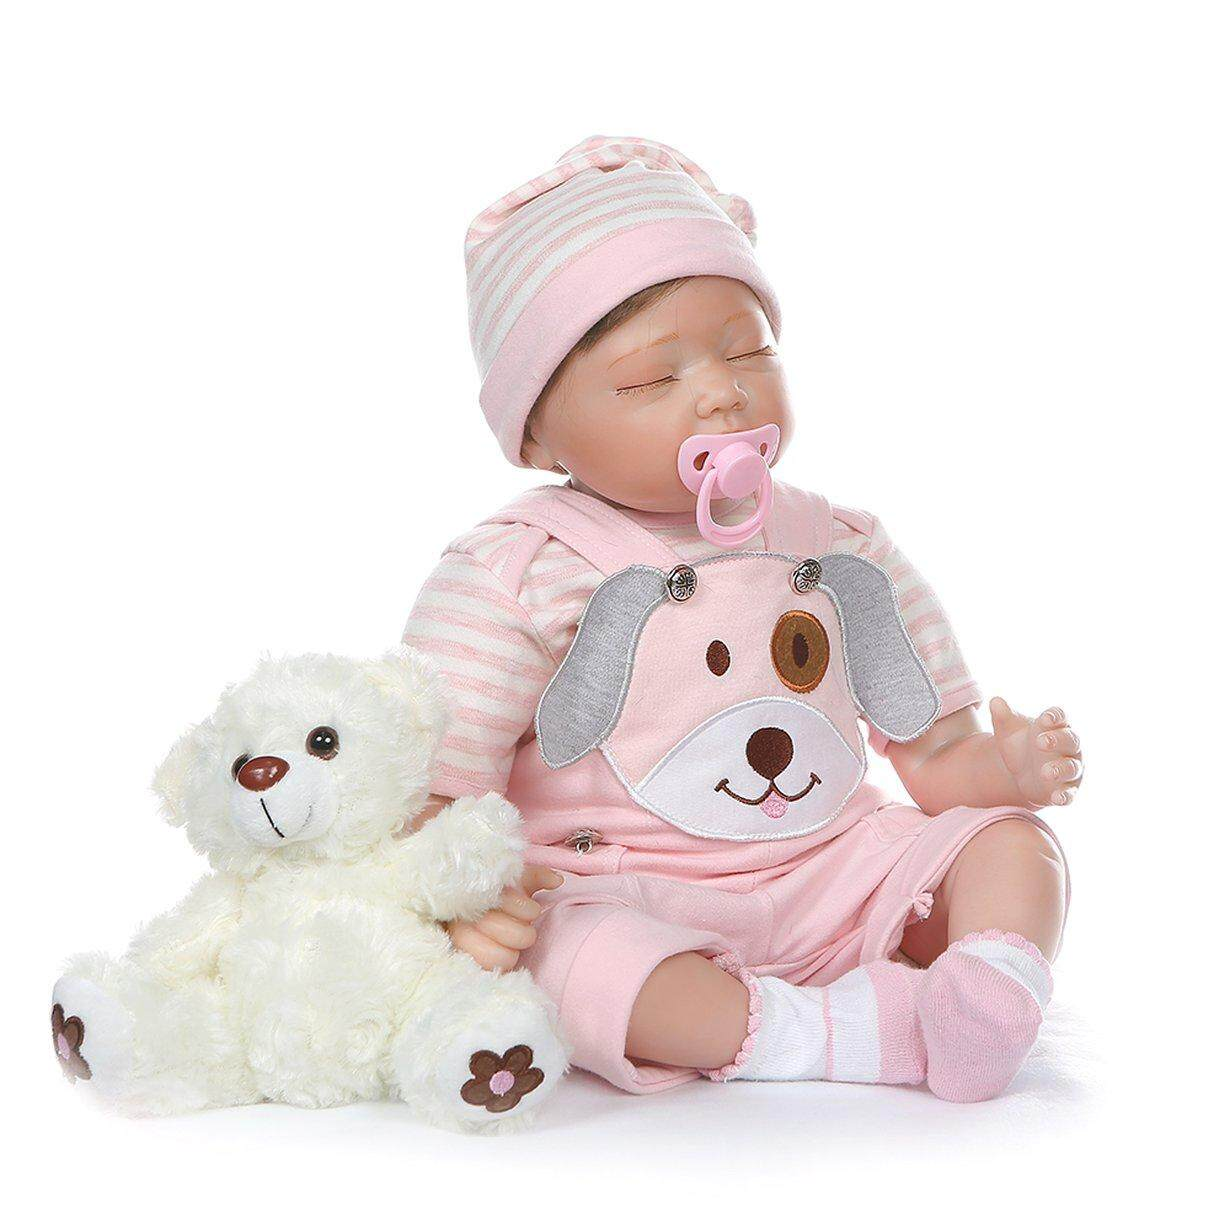 Hot Sale Simulation Doll Cloth Simulation Doll New Chemical Fiber Hair Powder Strap Dog